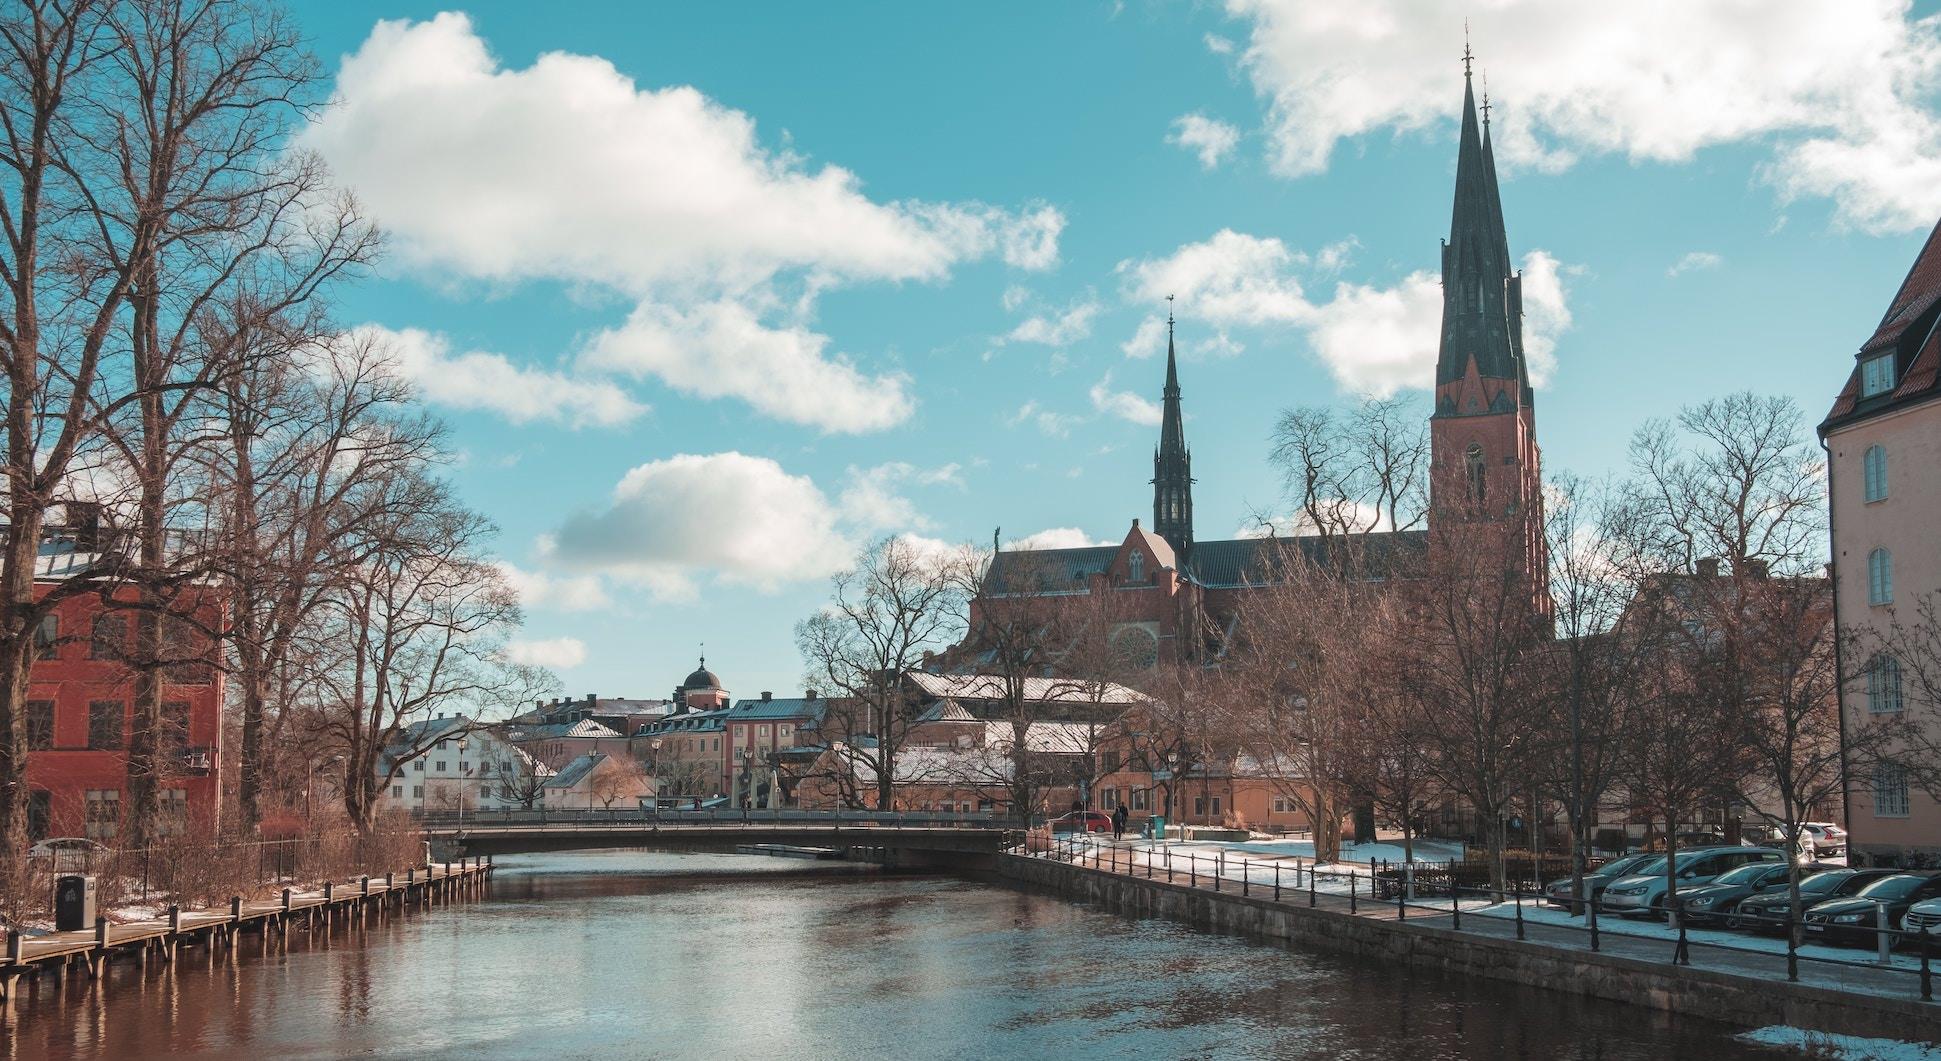 Turistaktiviteter i Uppsala